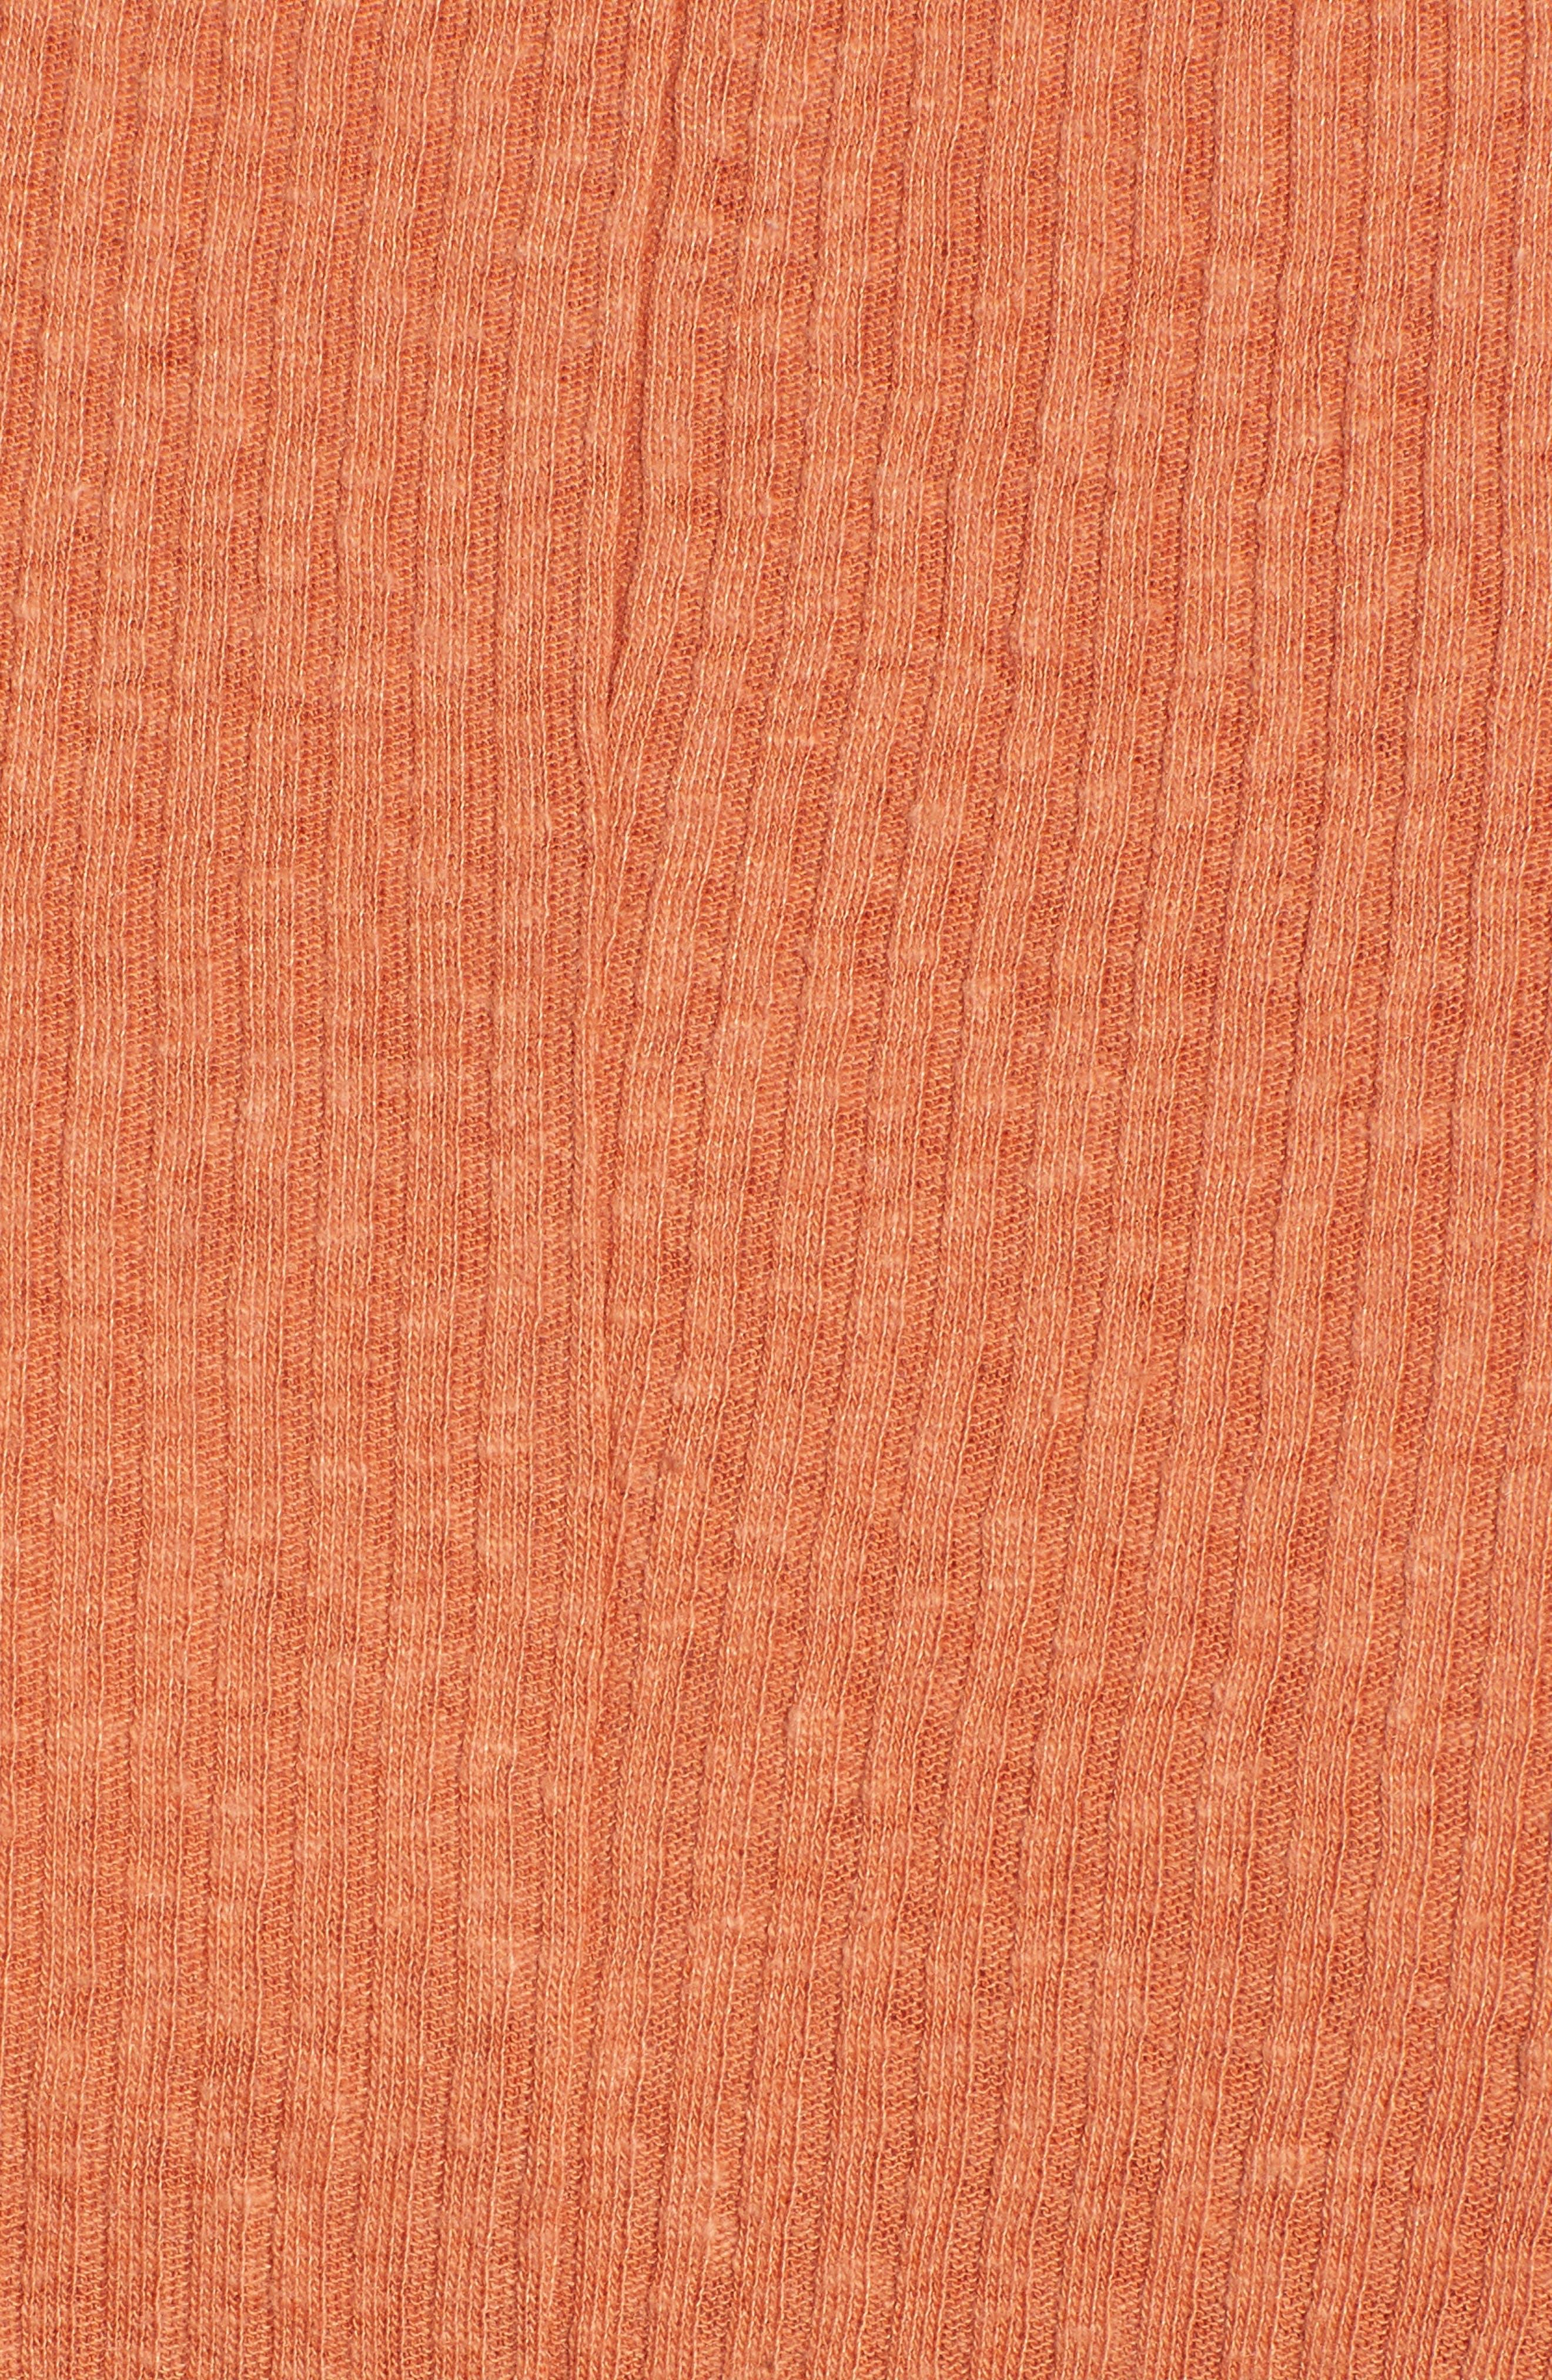 Twist Front Tee,                             Alternate thumbnail 5, color,                             Rust Leaf